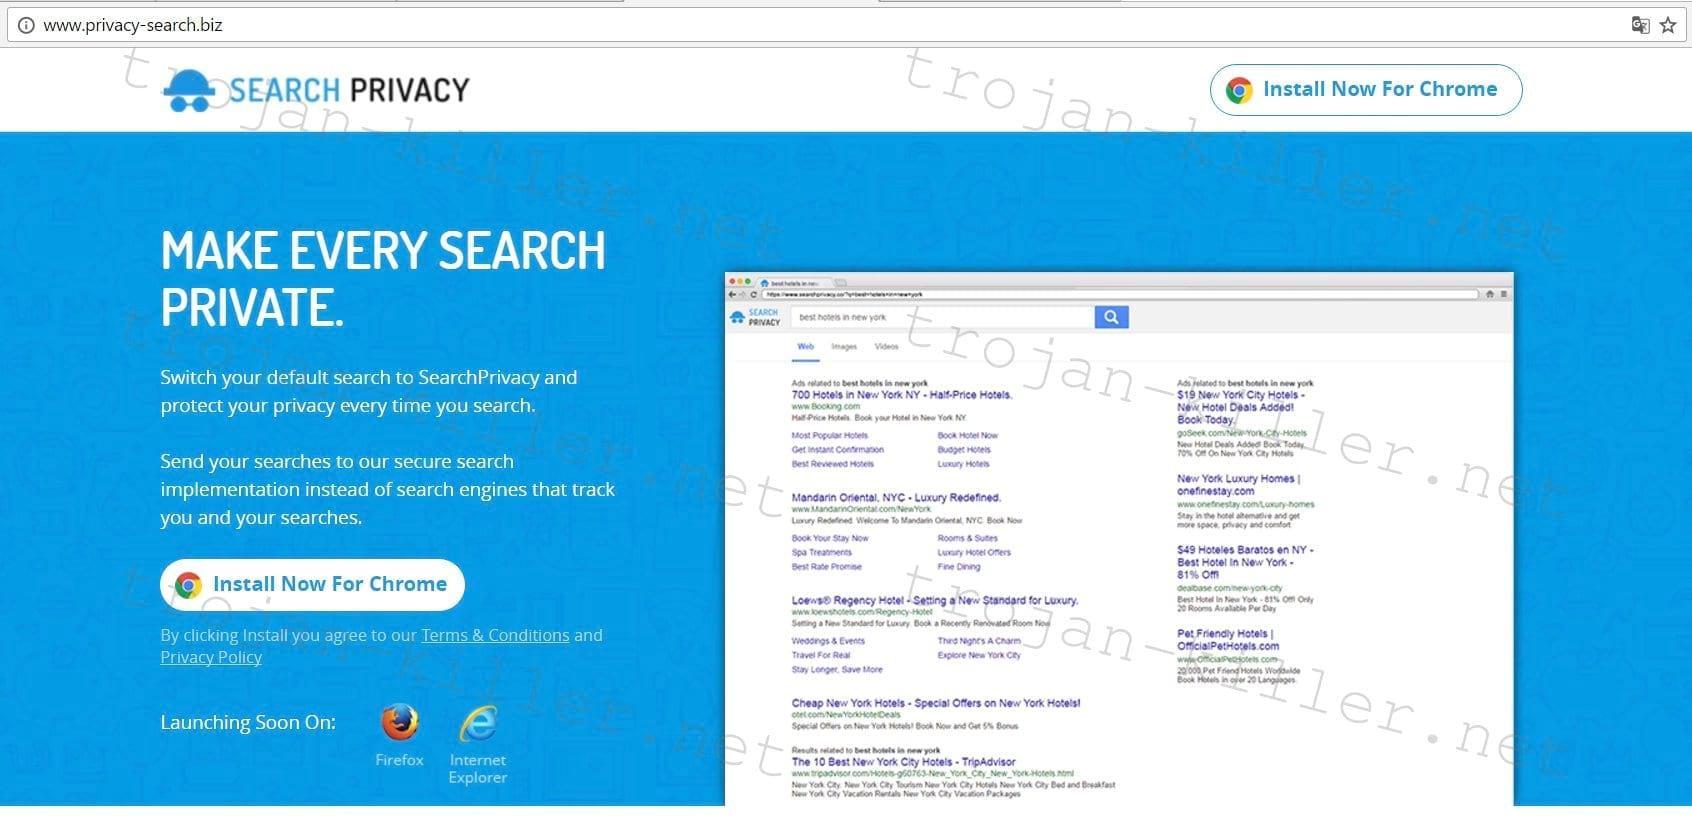 Privacy-search.biz